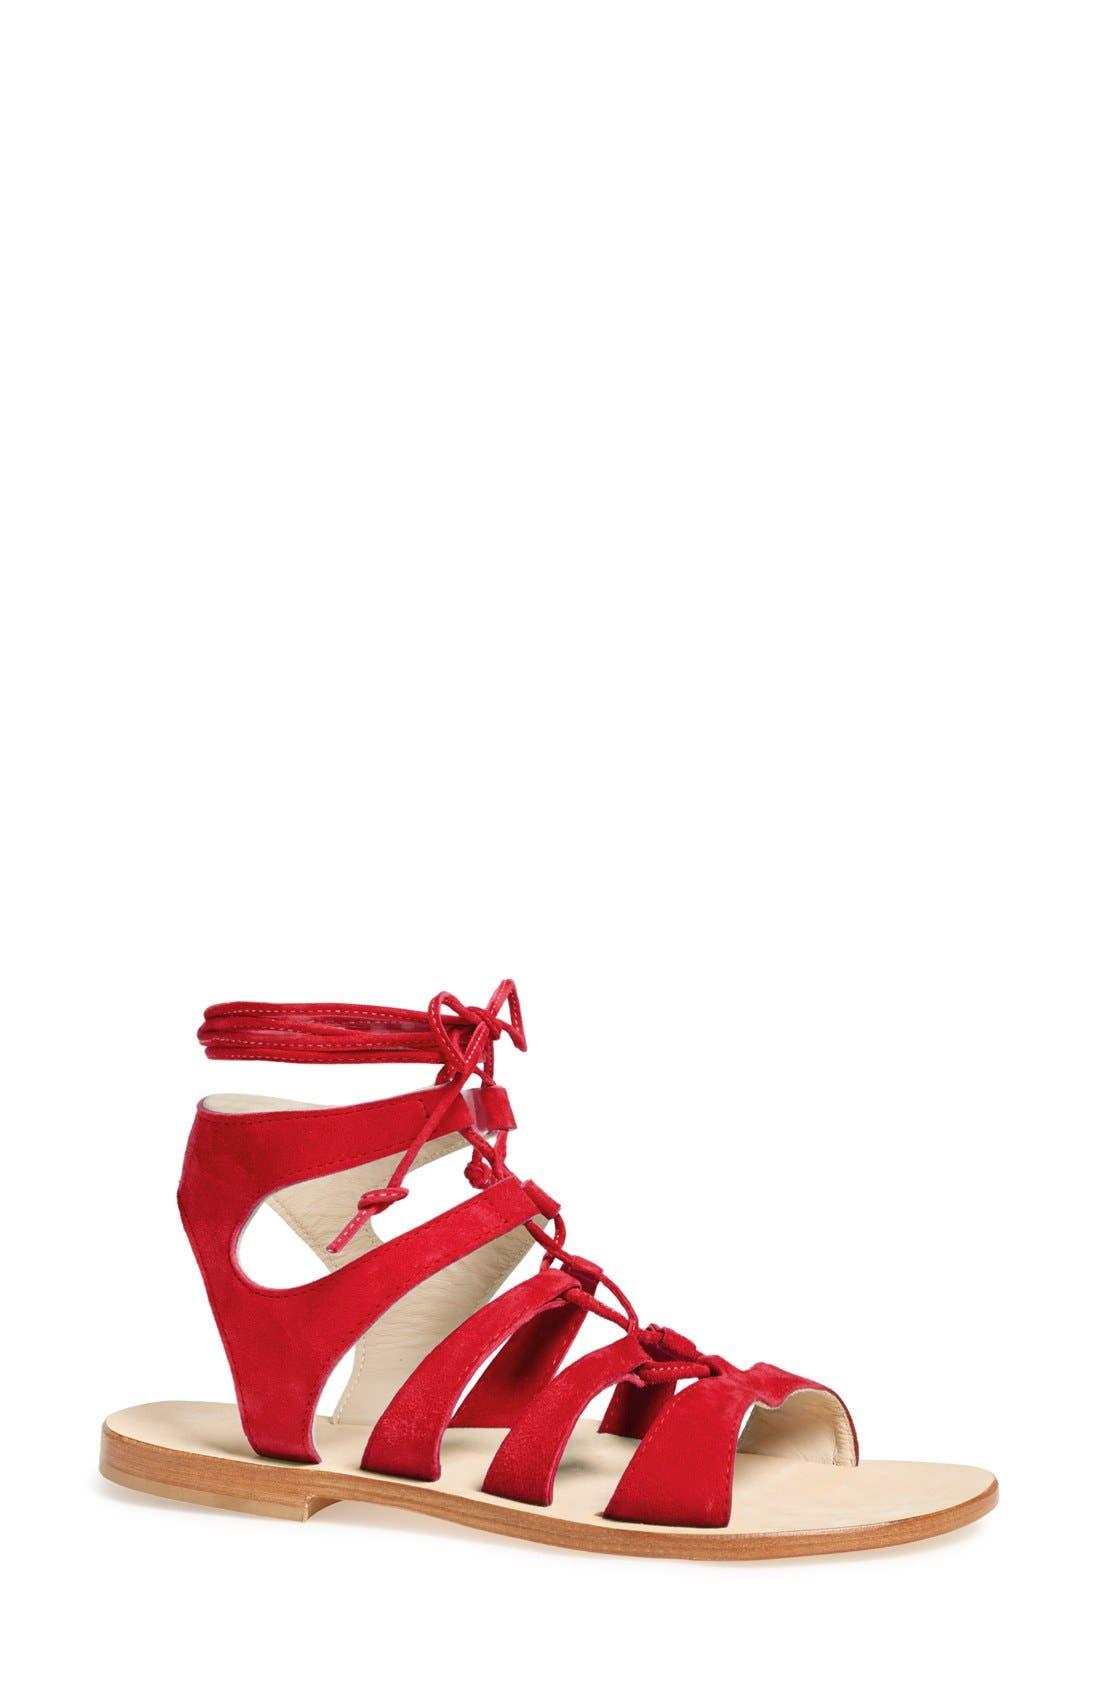 Alternate Image 1 Selected - Cornetti 'Recommone' Gladiator Sandal (Women)